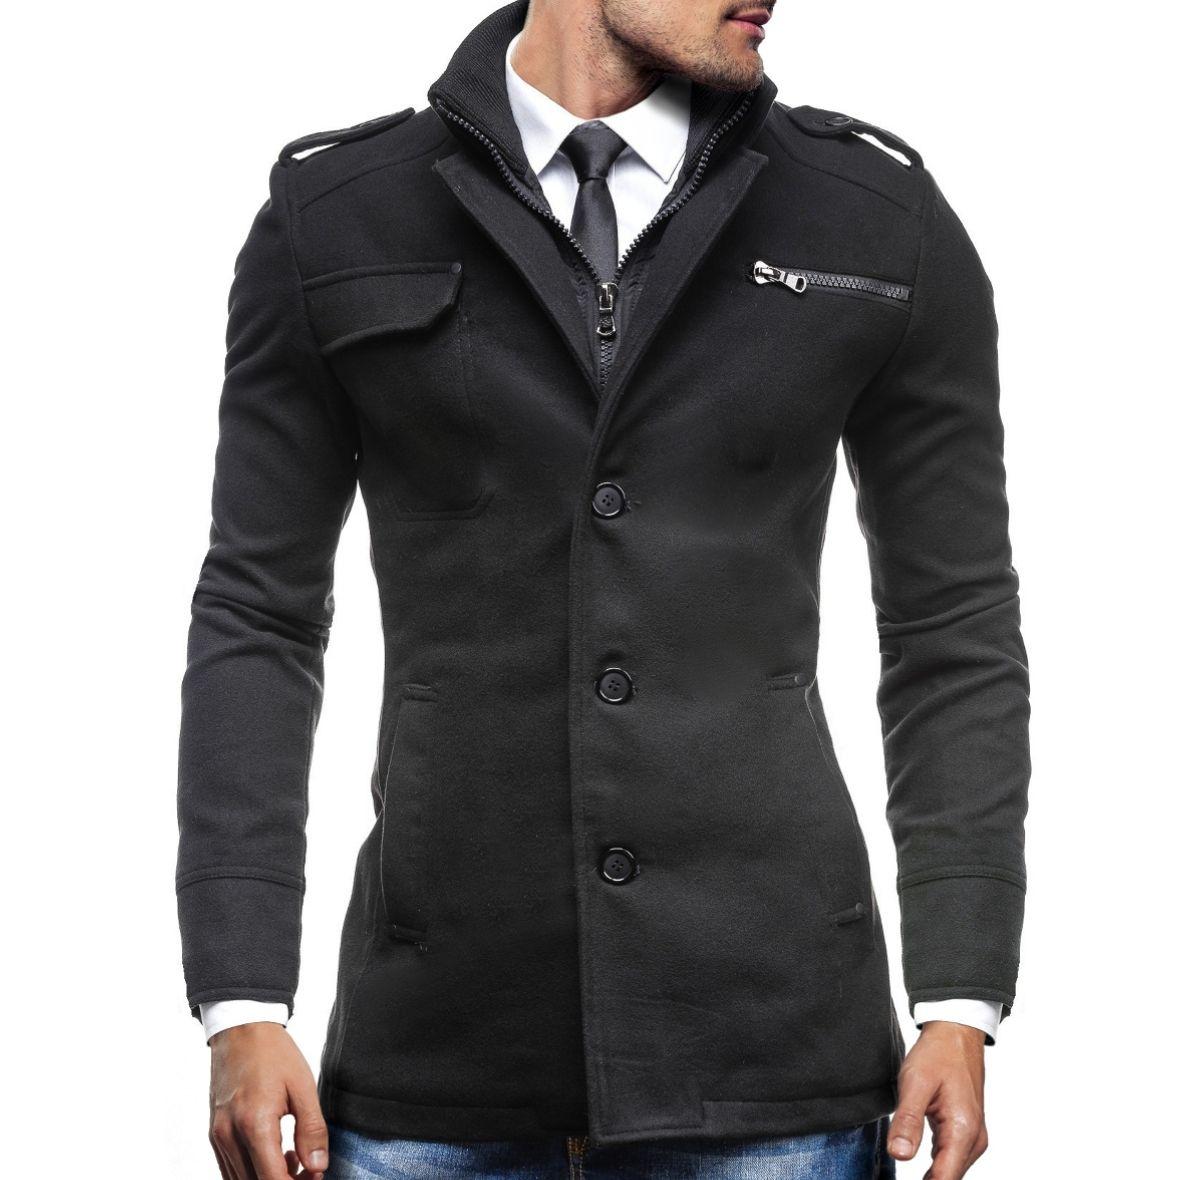 BOLF PPM 8856 Herrenmantel Schwarz Mantel Jacke TOP Wintermantel Men 4D4 Sakko